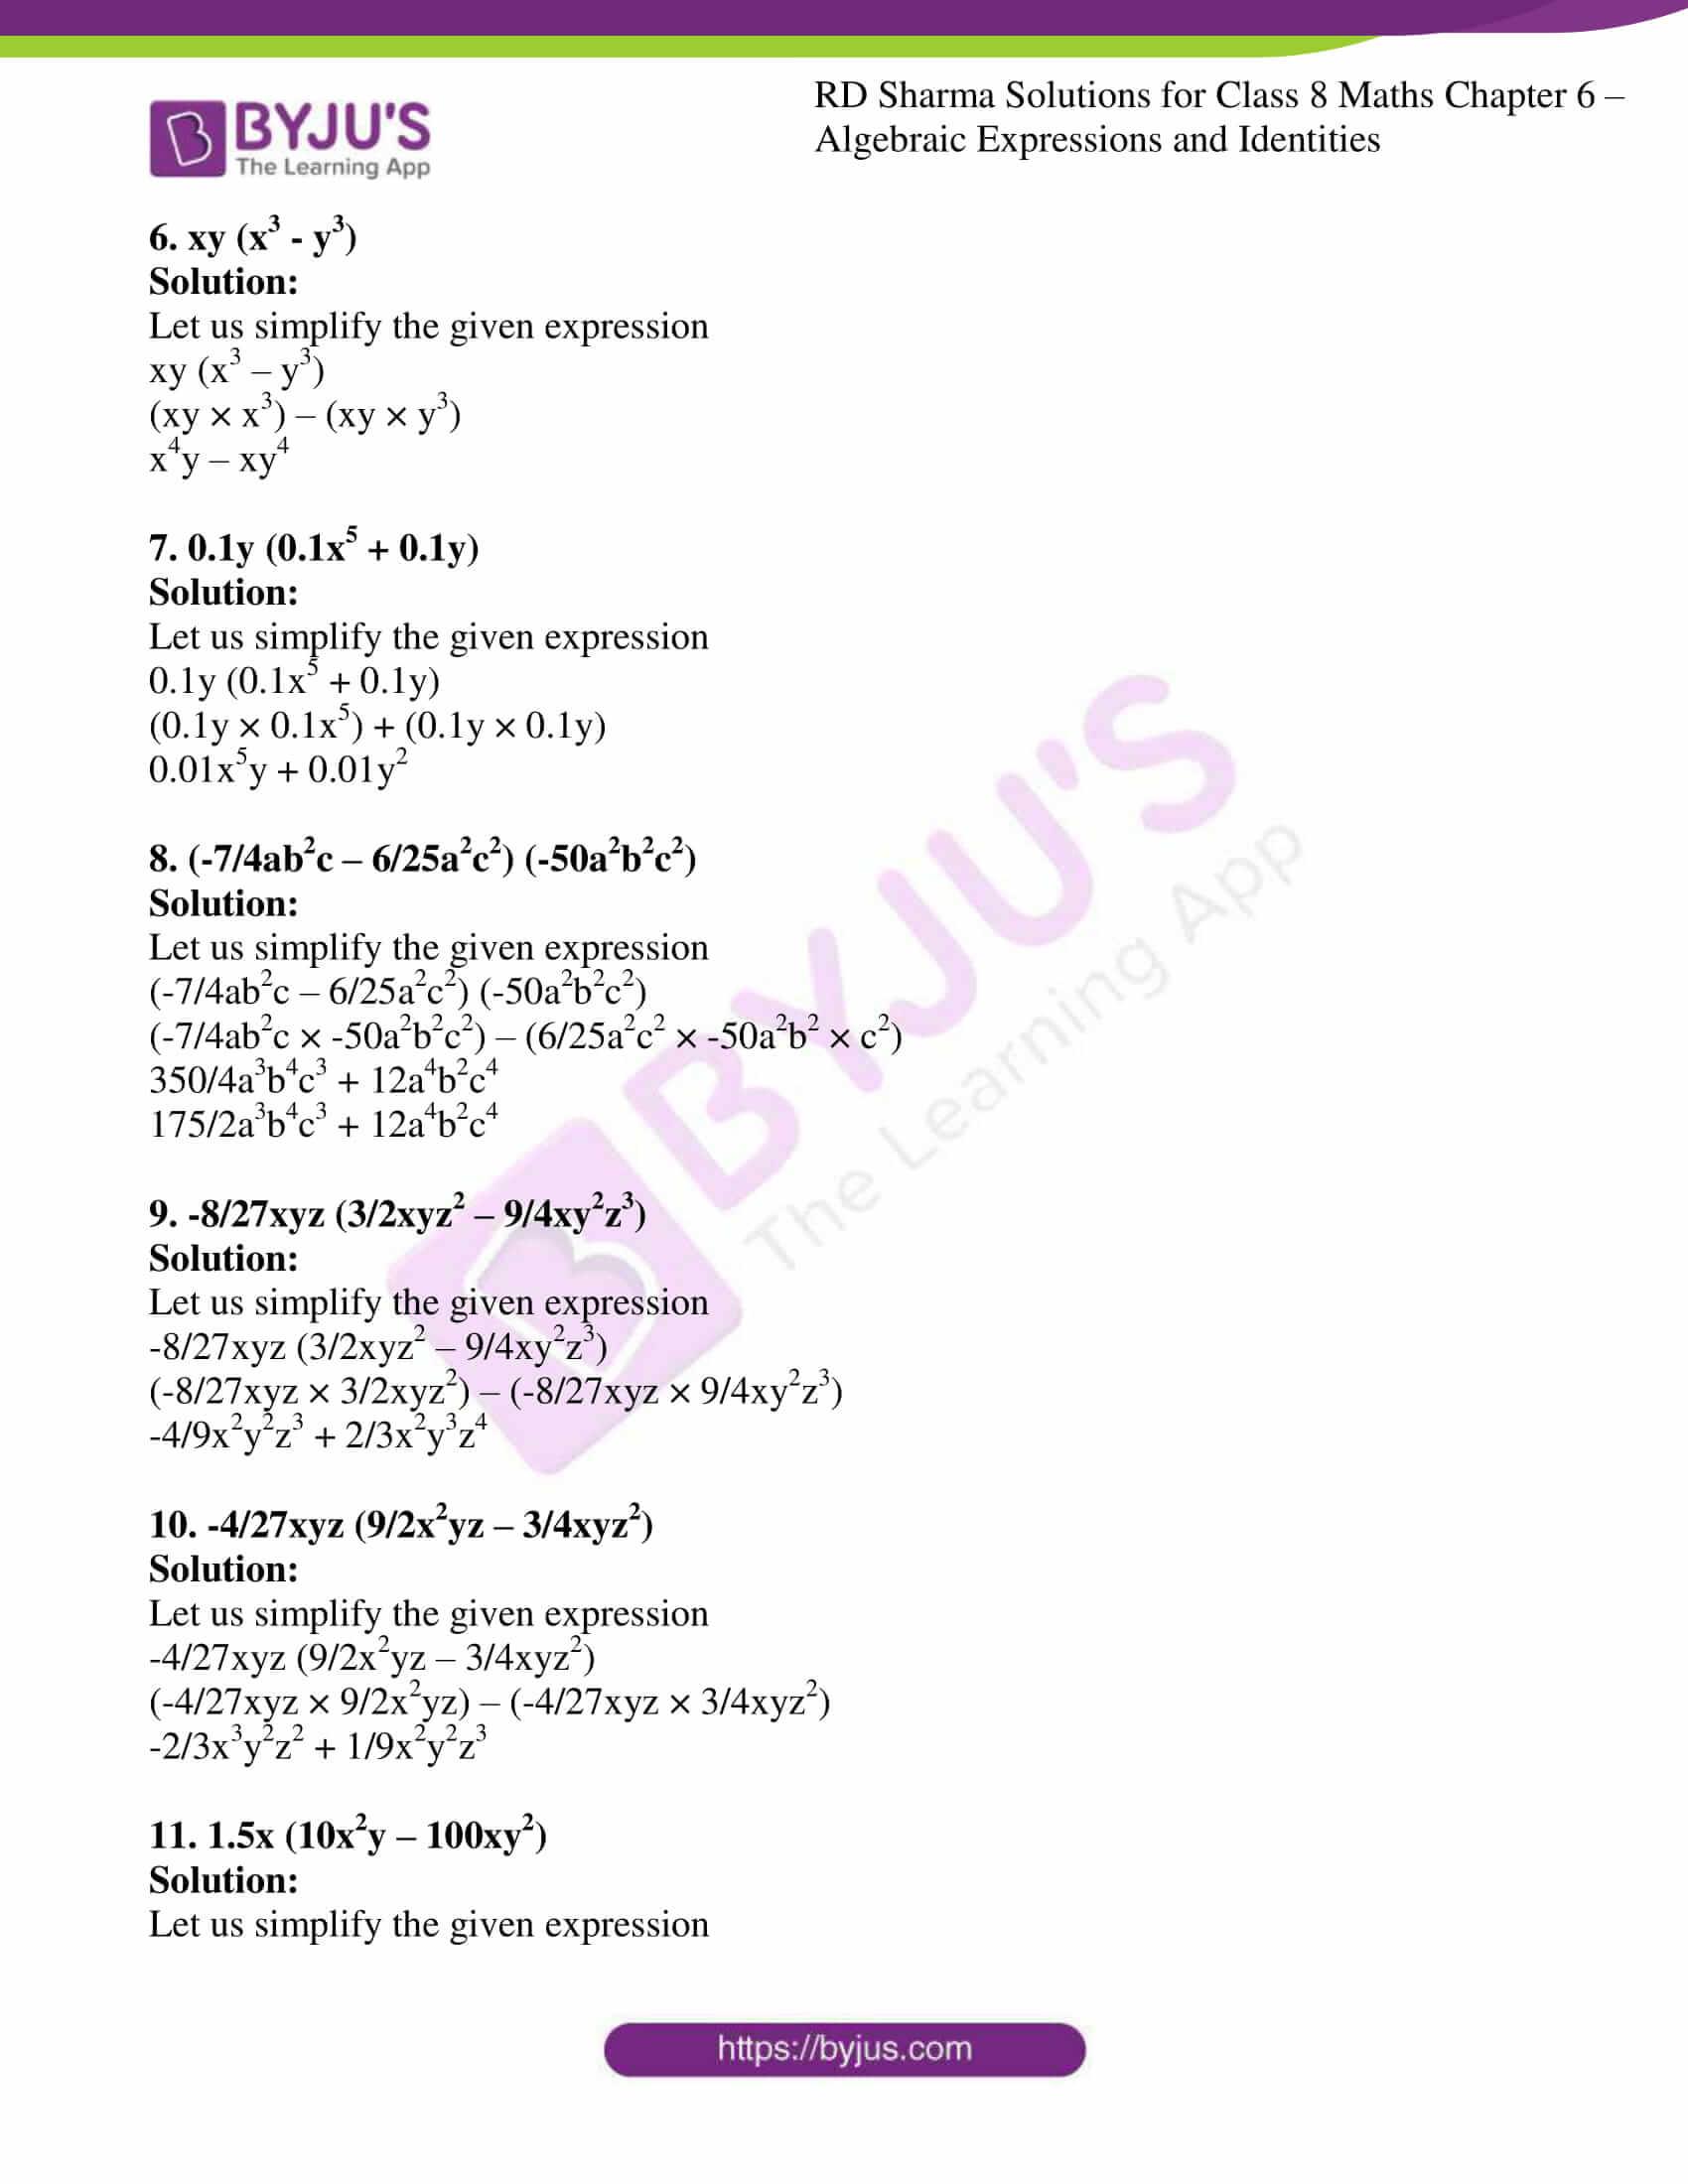 rd sharma class 8 maths chapter 6 exercise 4 2